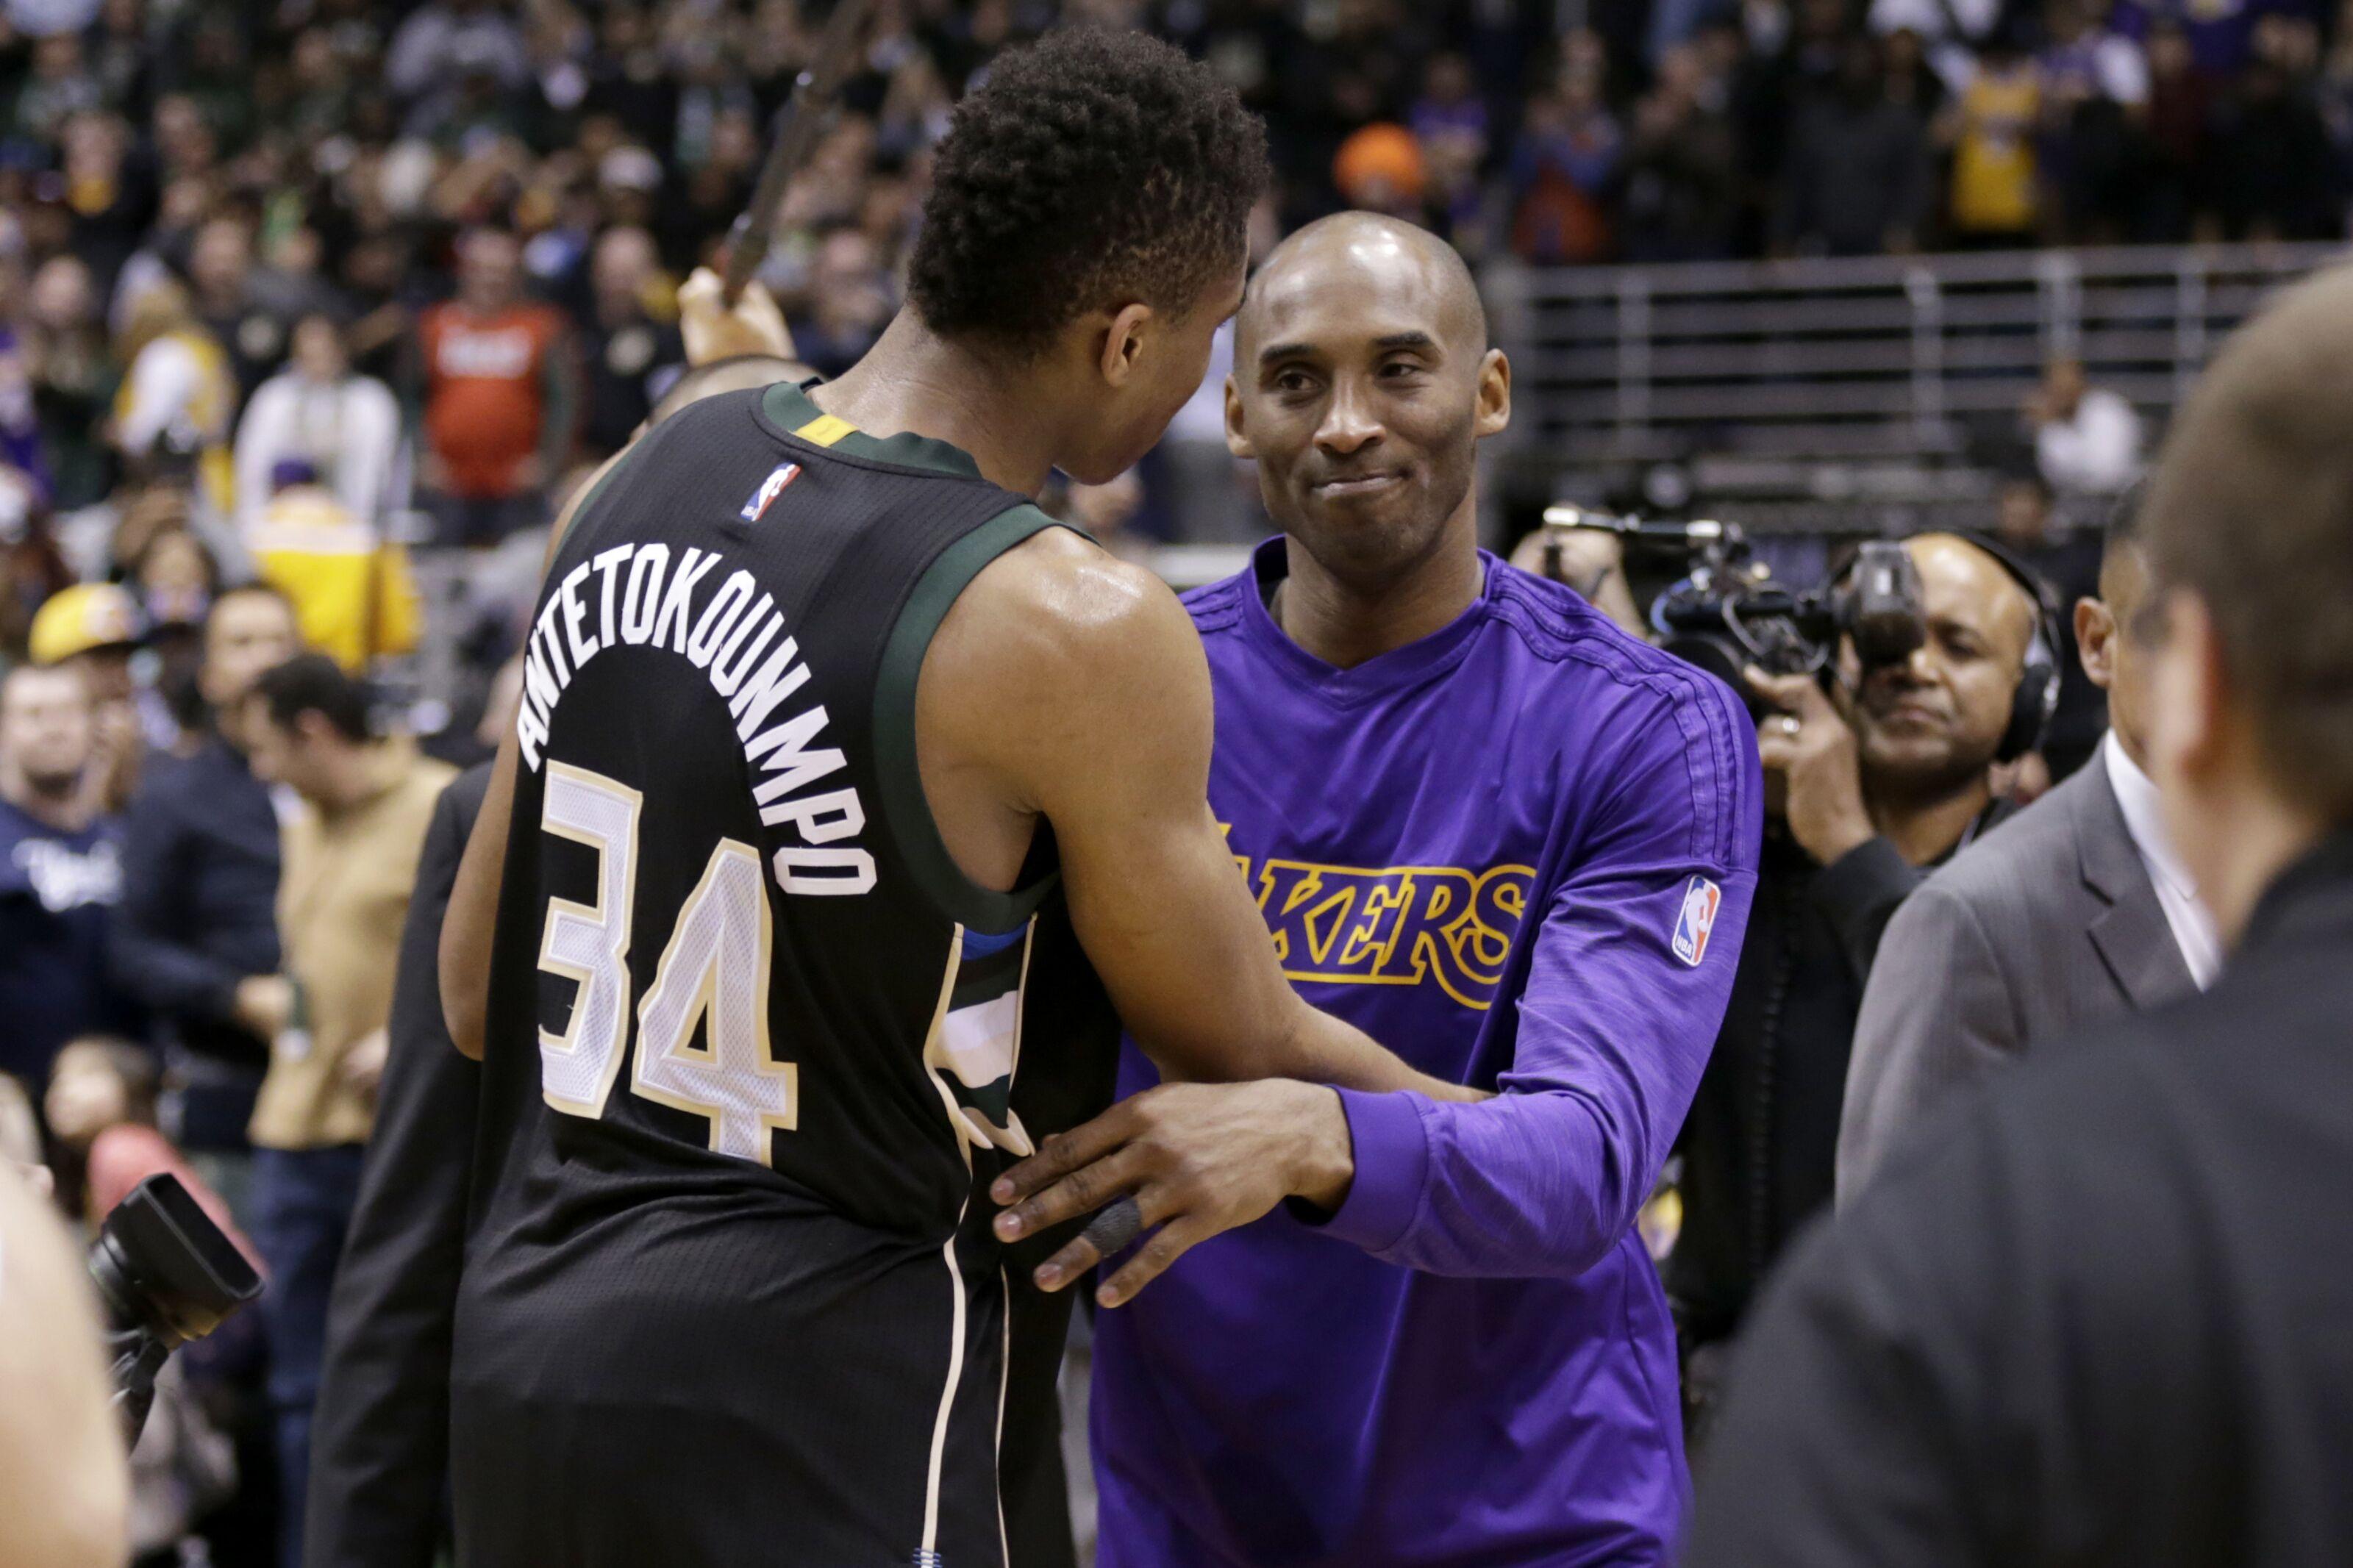 Los Angeles Lakers: Pau Gasol sees similarities between Kobe Bryant and Giannis Antetokounmpo